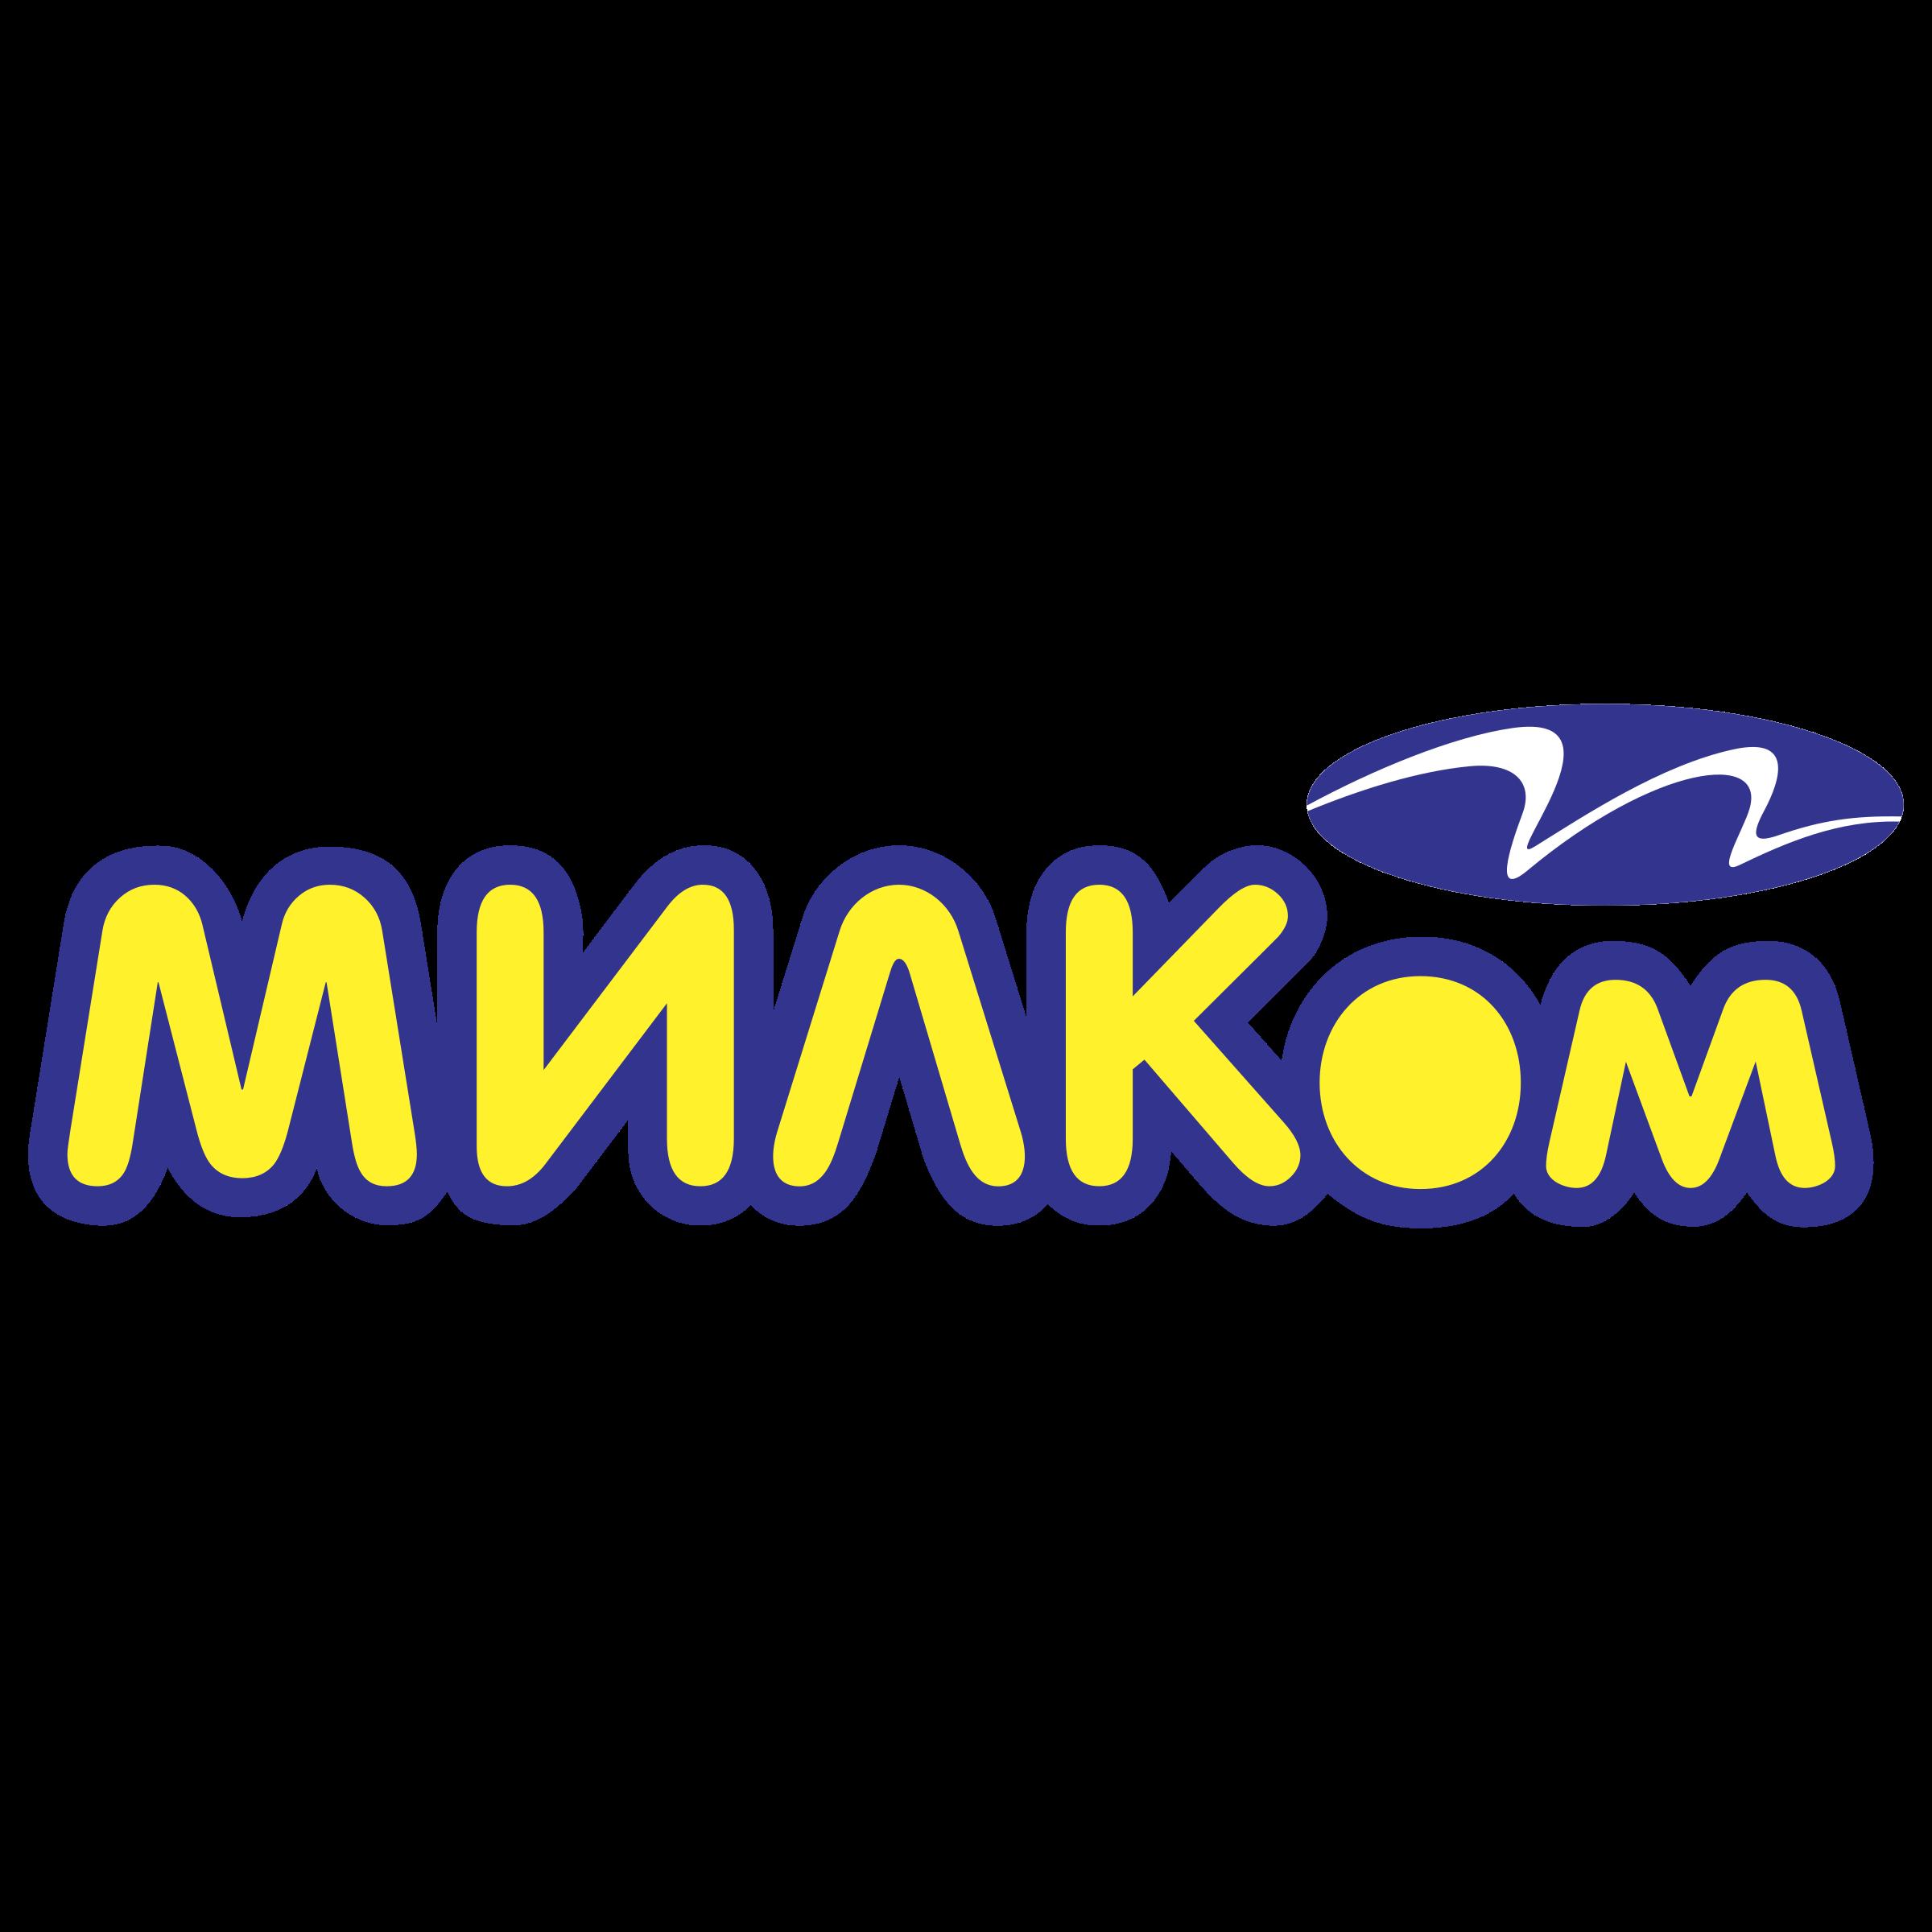 5d034e37d49 Milkom Logo PNG Transparent   SVG Vector - Freebie Supply